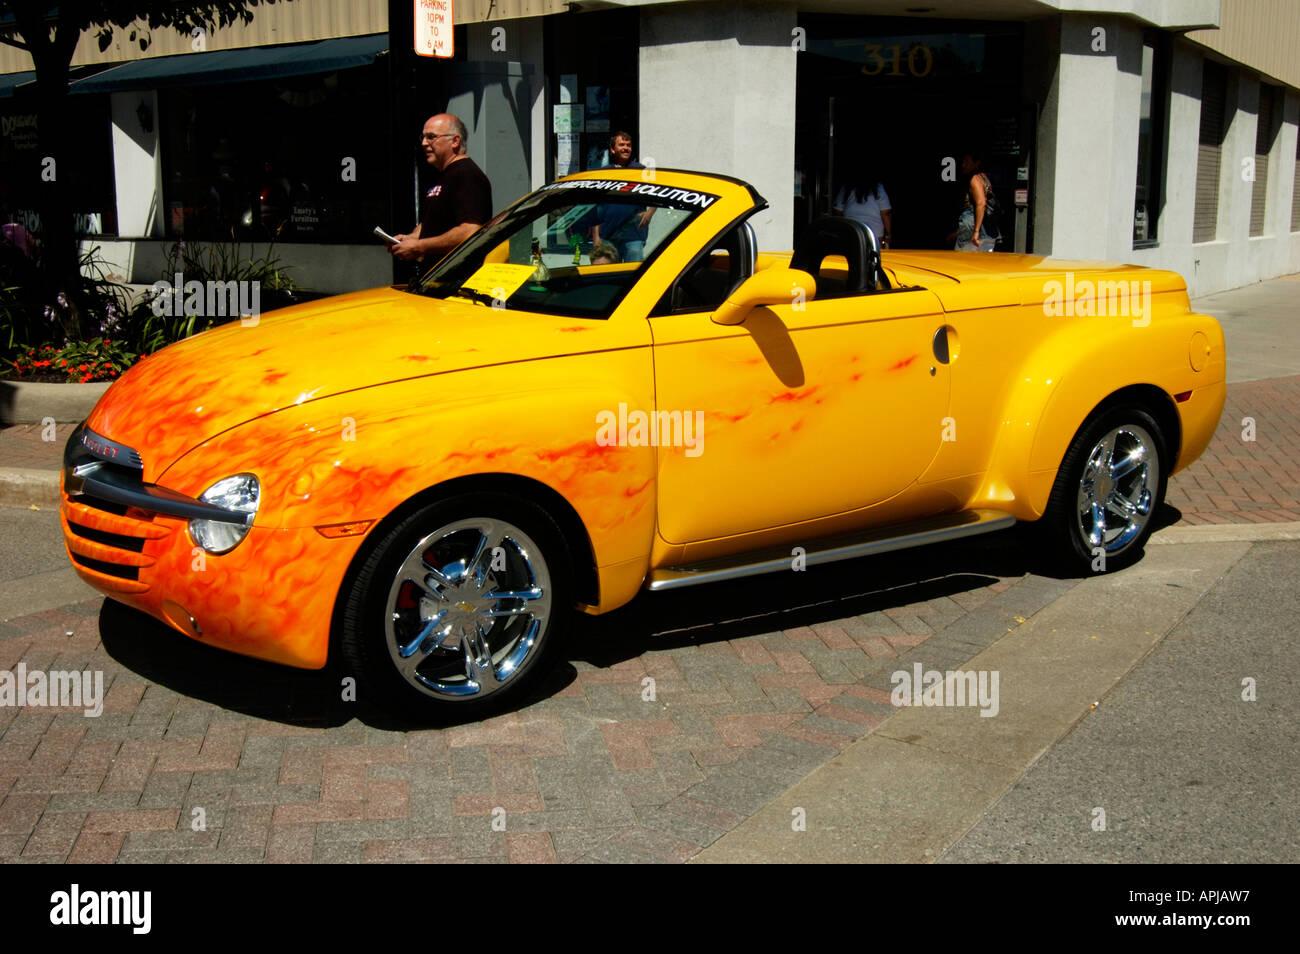 2004 Chevy Ssr Lkw Stockfotografie Alamy